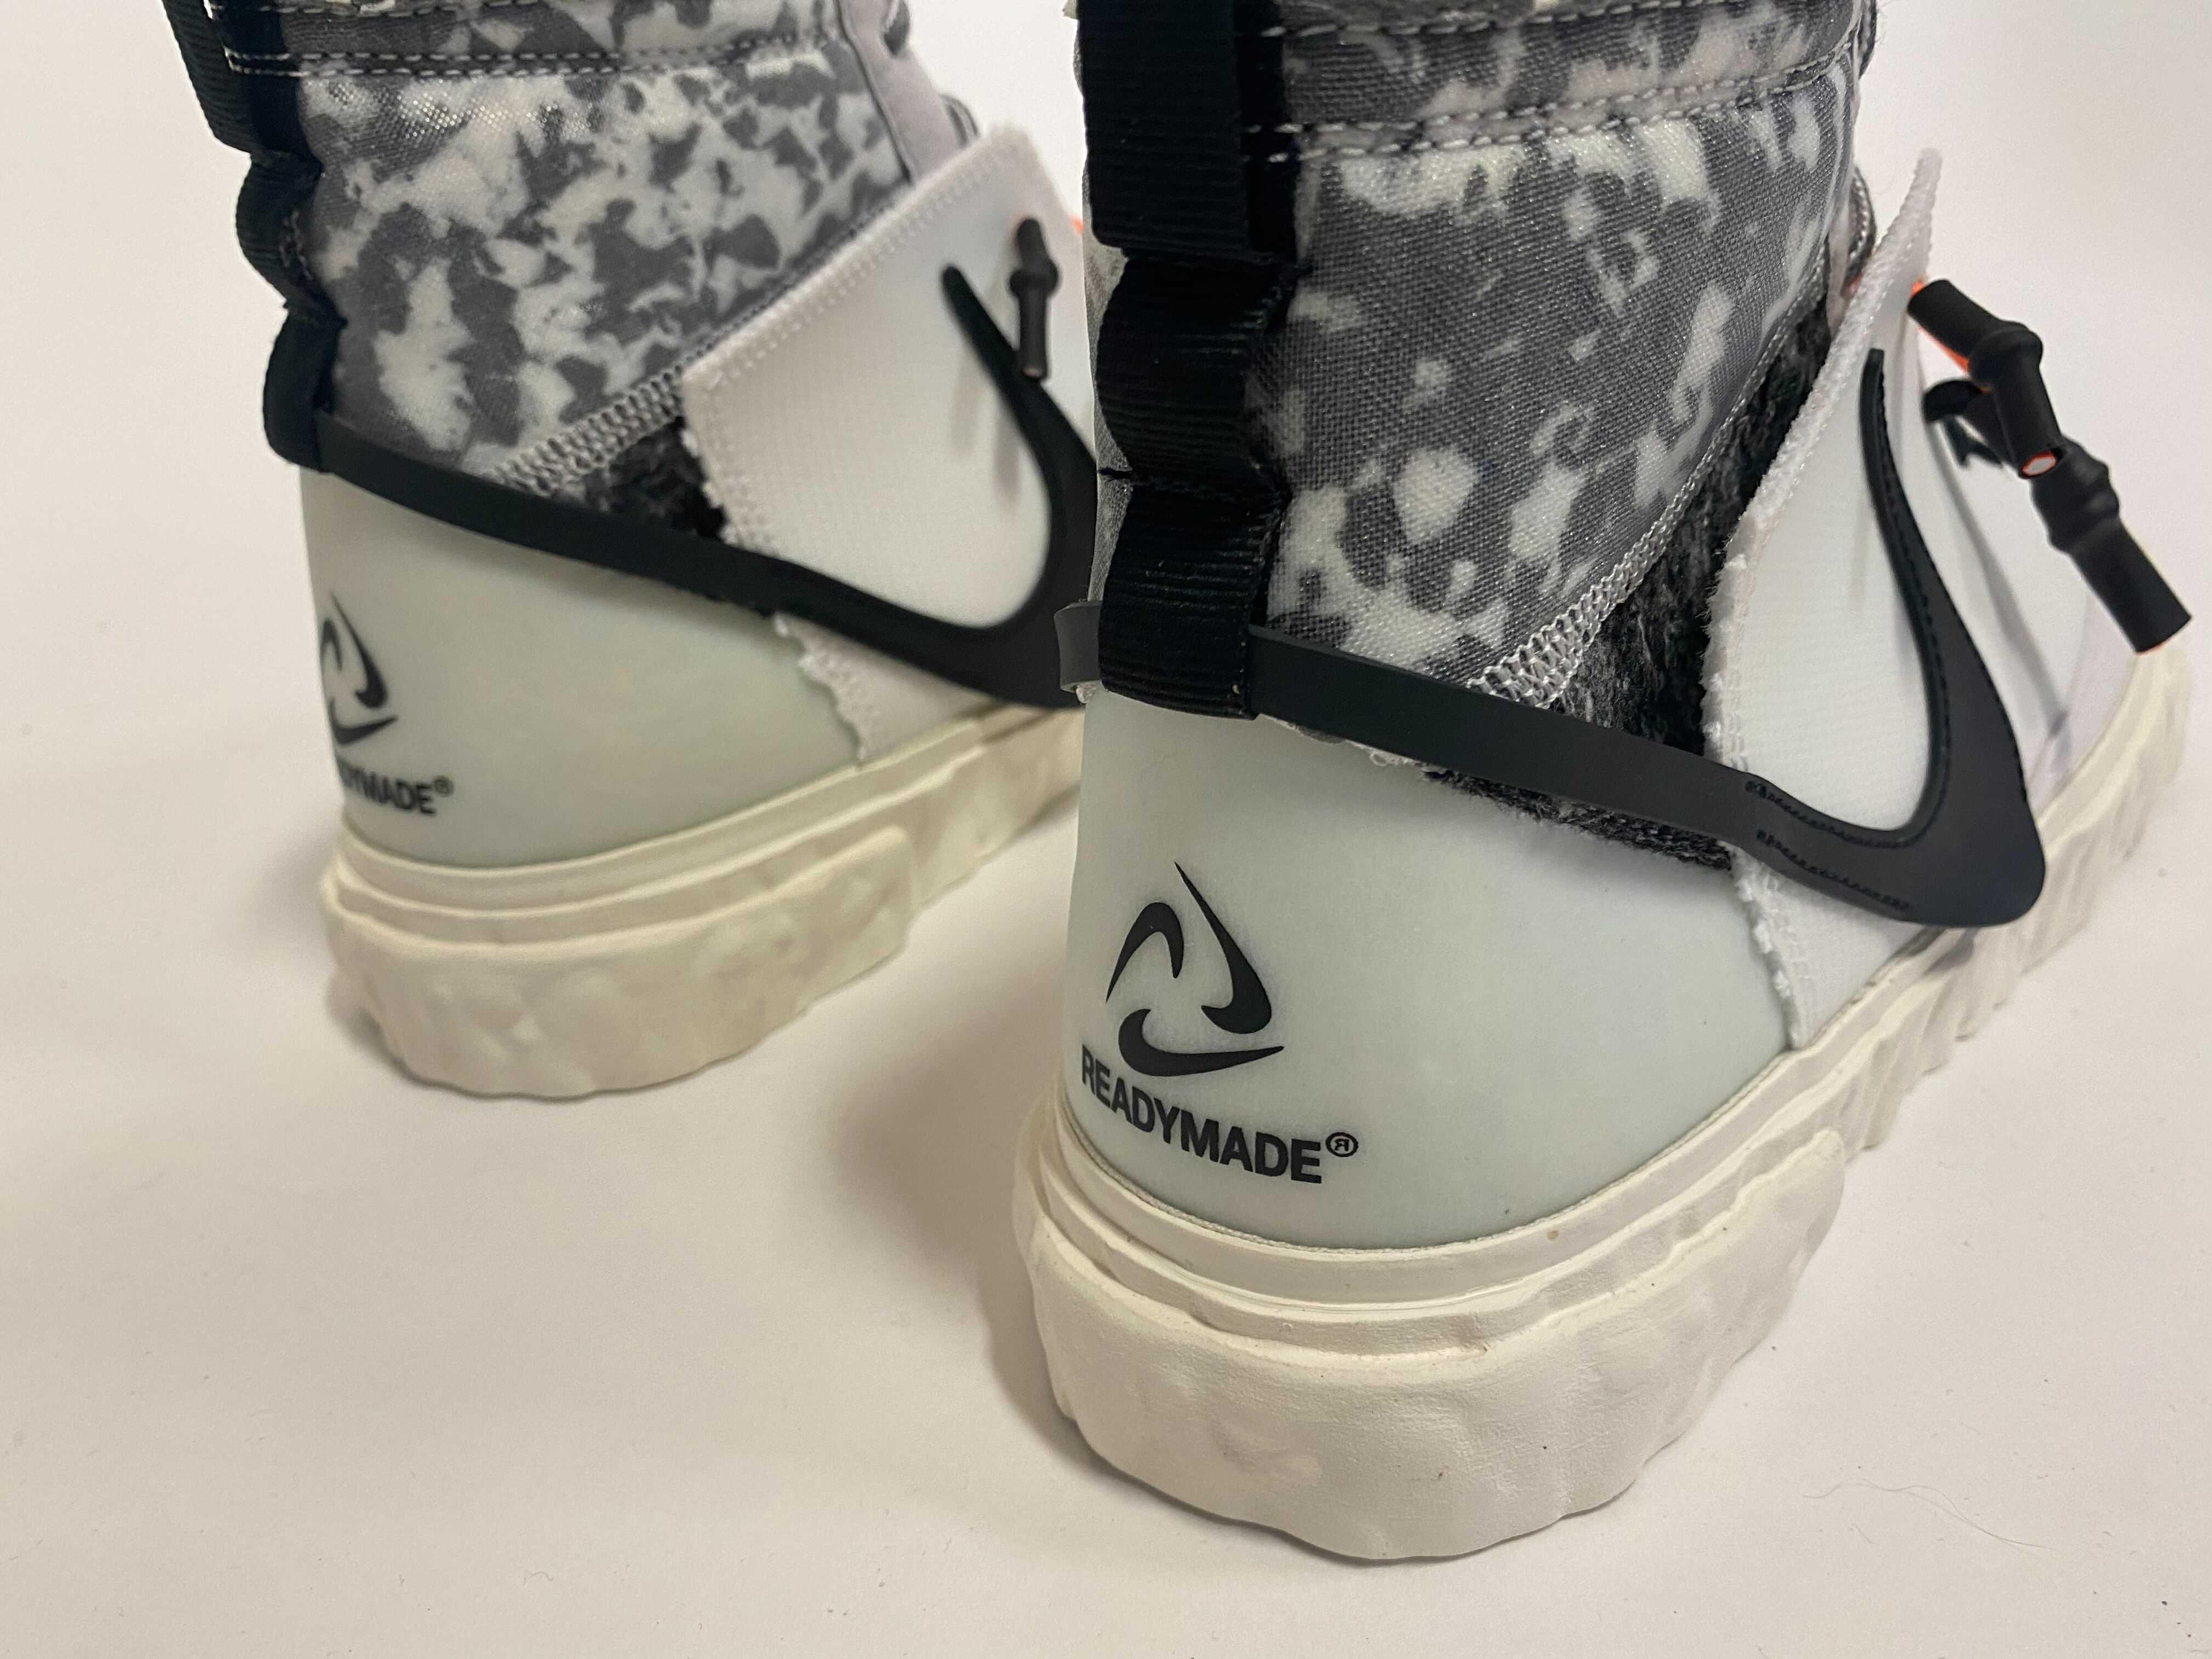 Readymade x Nike Blazer Mid 'White' (Heel)